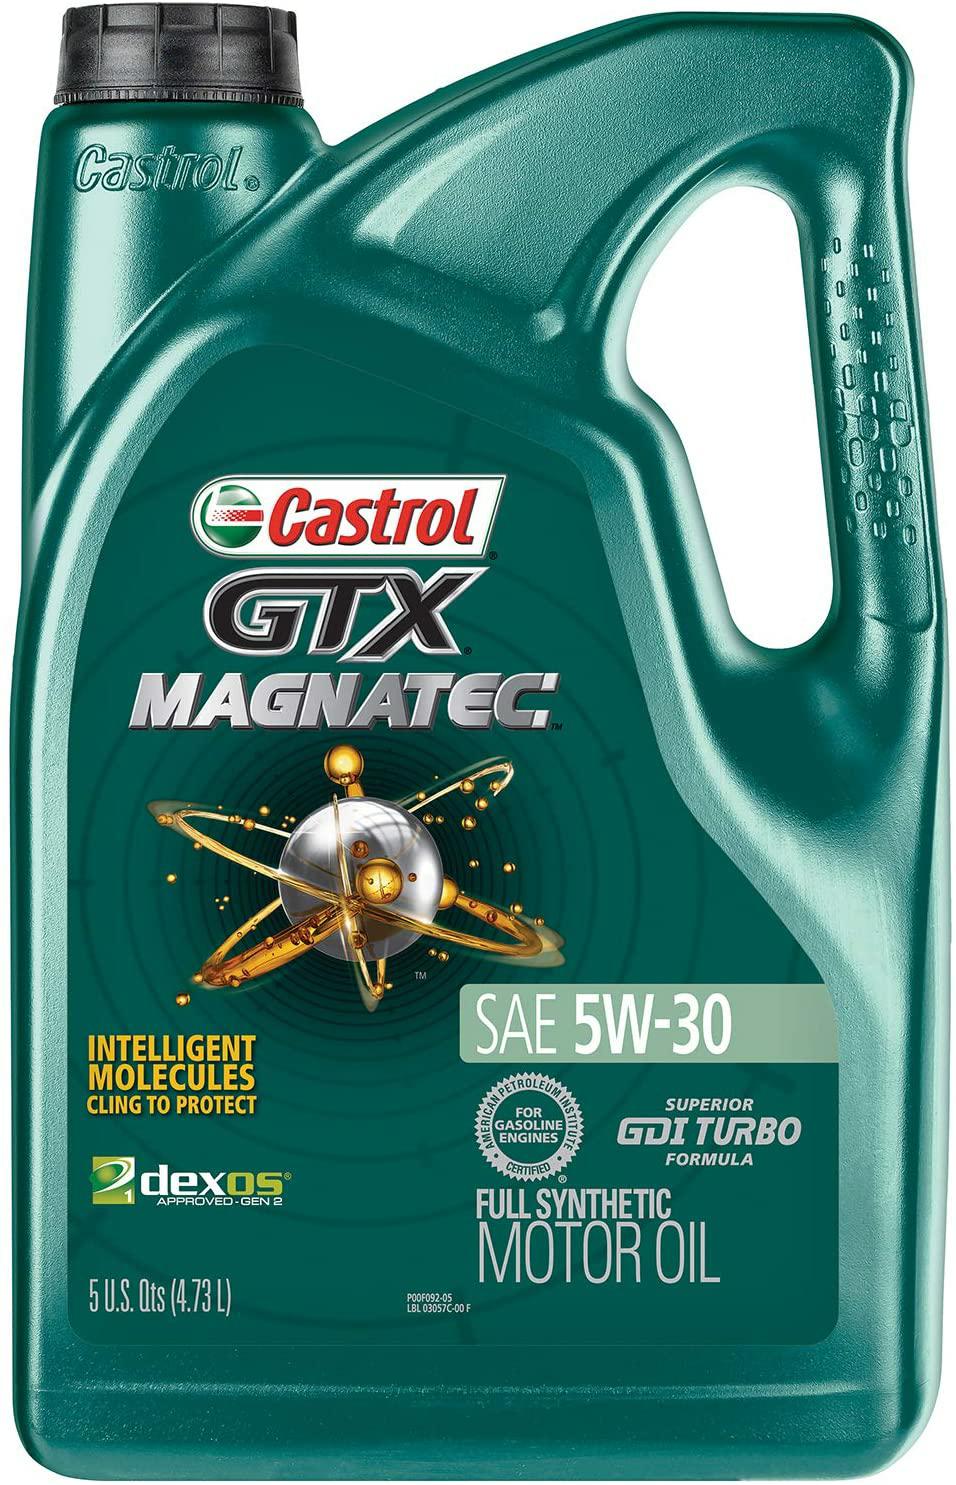 Castrol GTX MAGNATEC 5W-30 Full Synthetic Motor Oil, 5 Quart, $16.97 $16.97